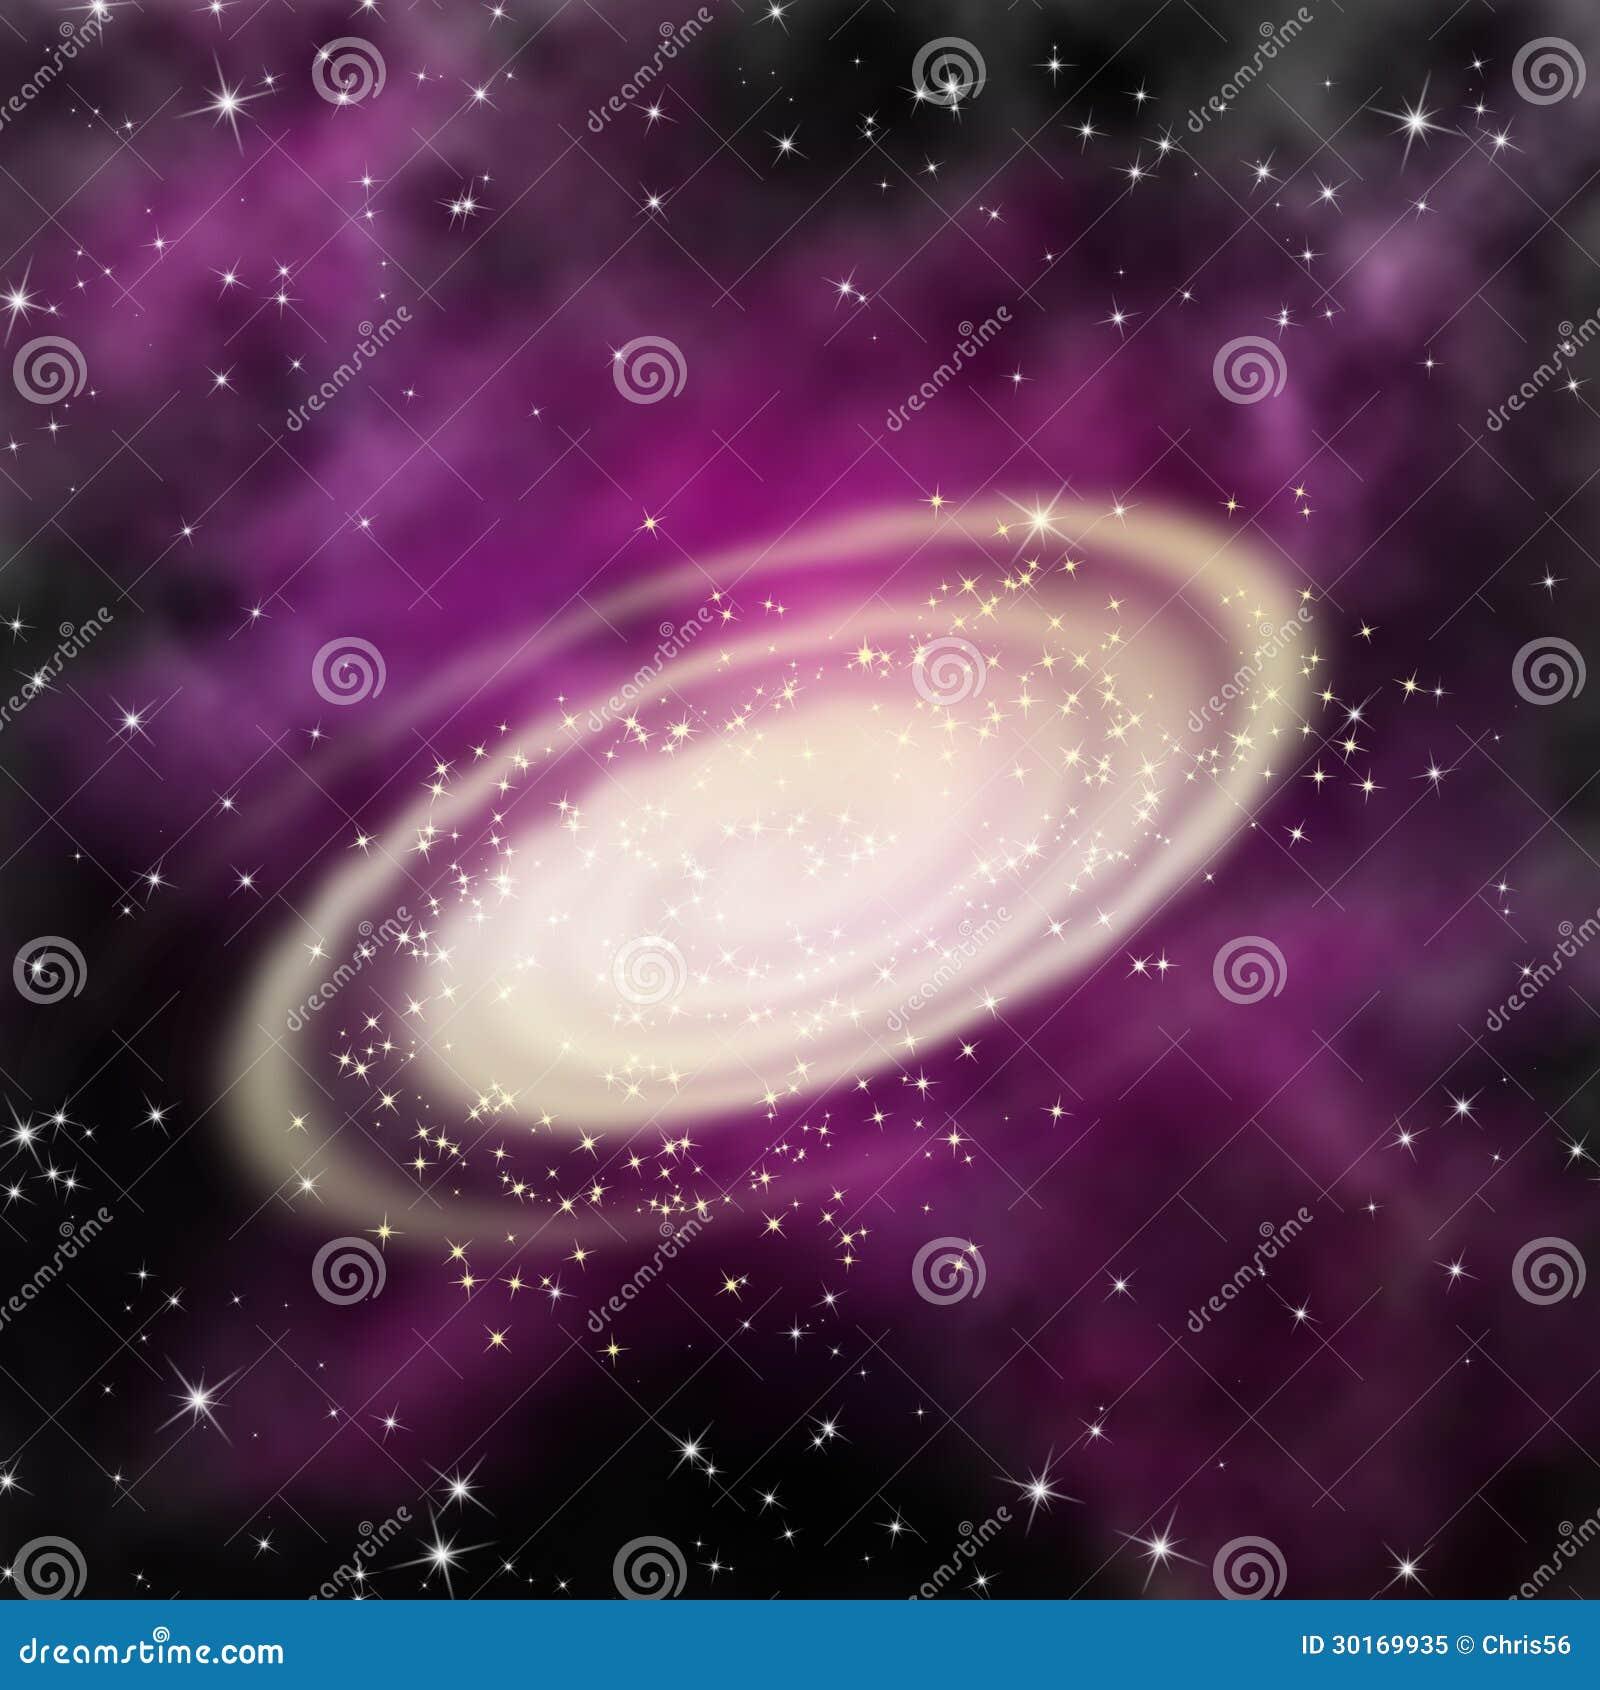 Mistiness stock illustration. Illustration of starry